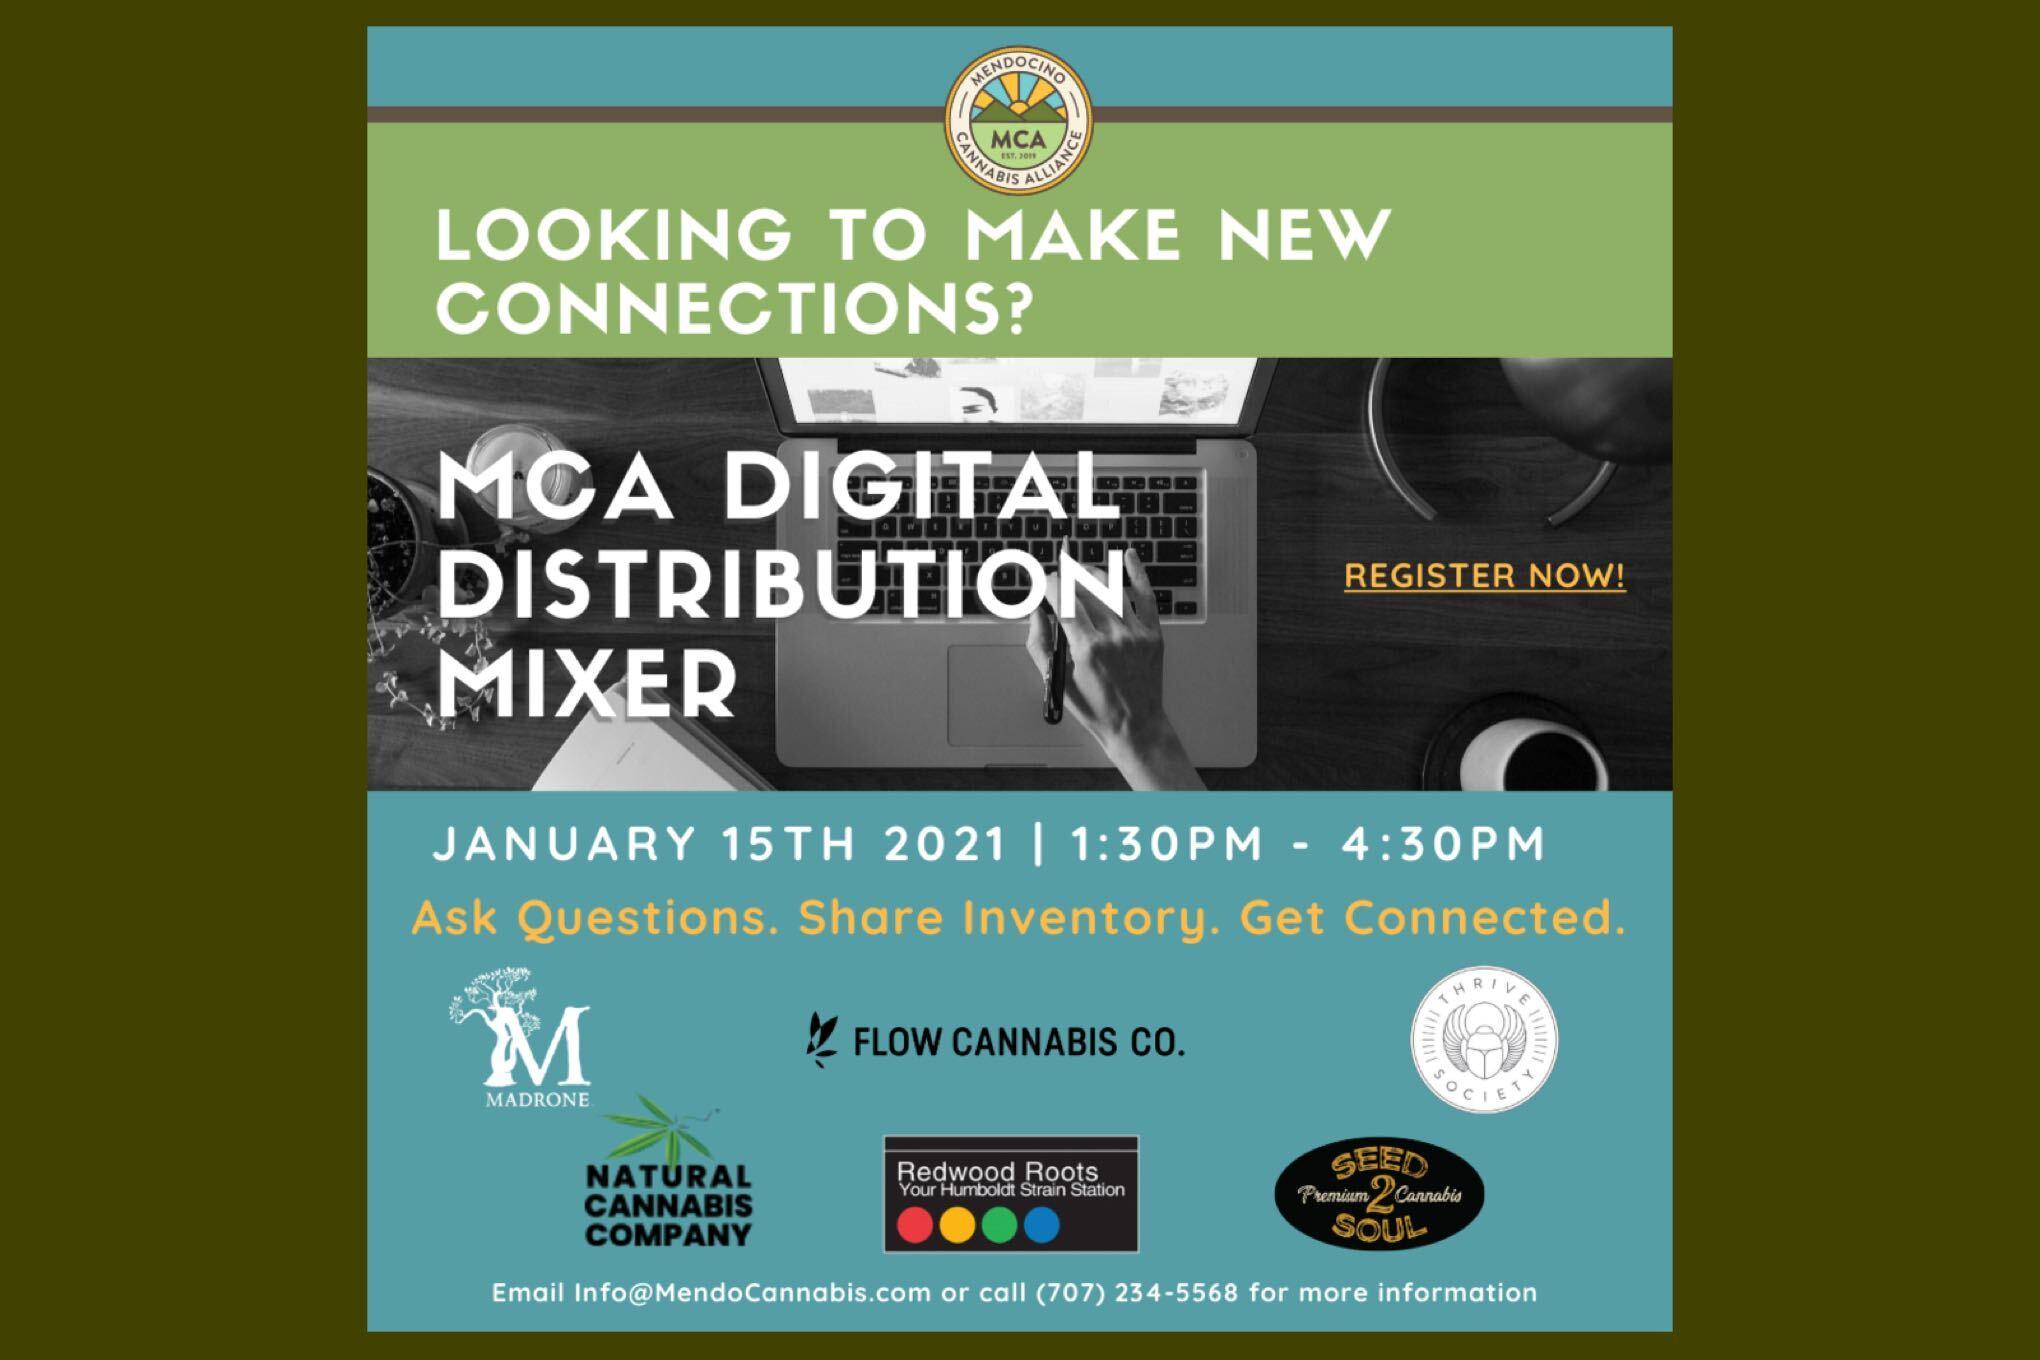 MCA Digital Distribution Mixer